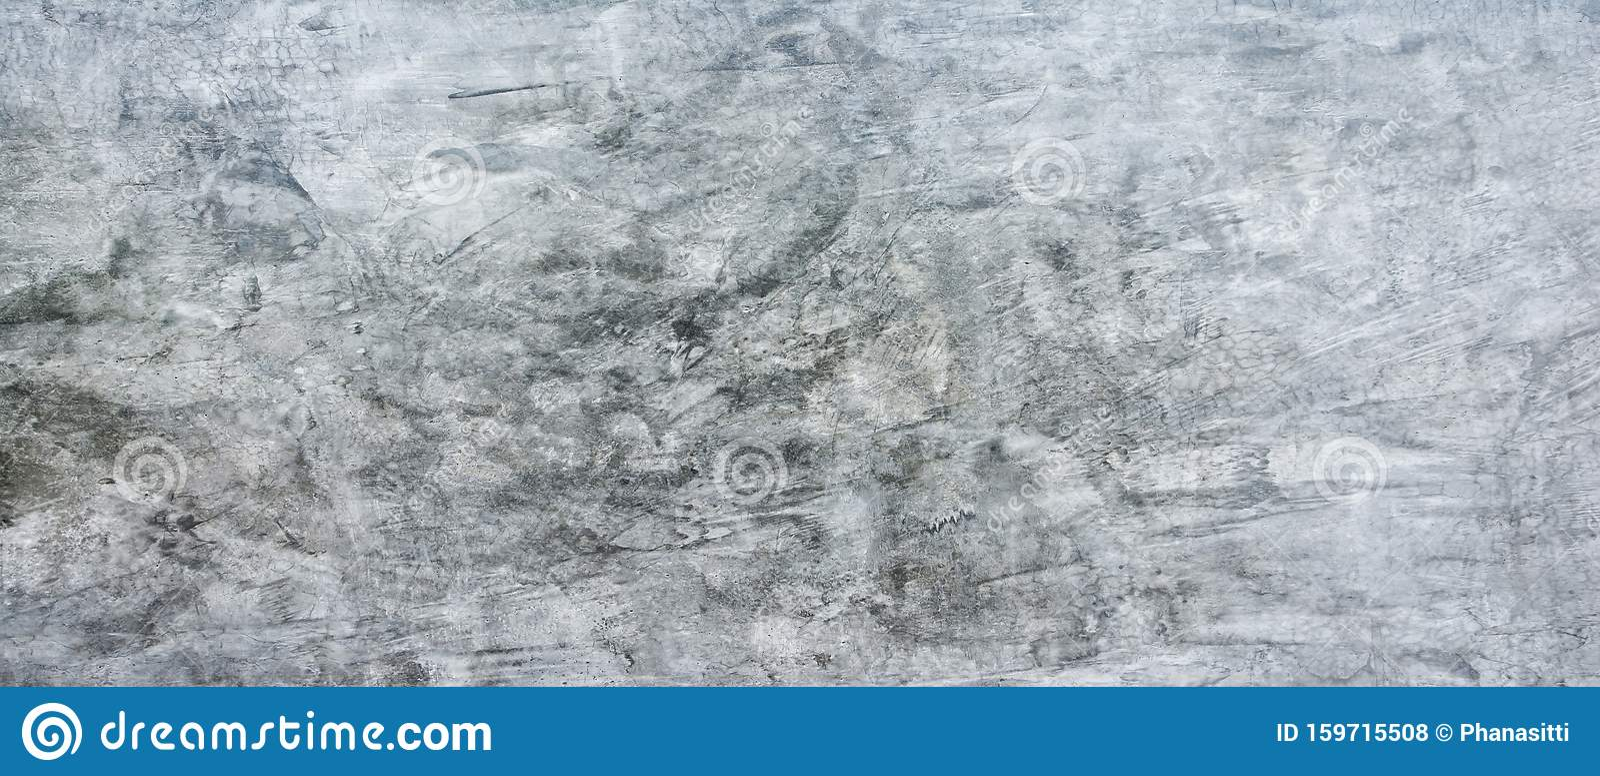 Бетон панорама тощий бетон это какой